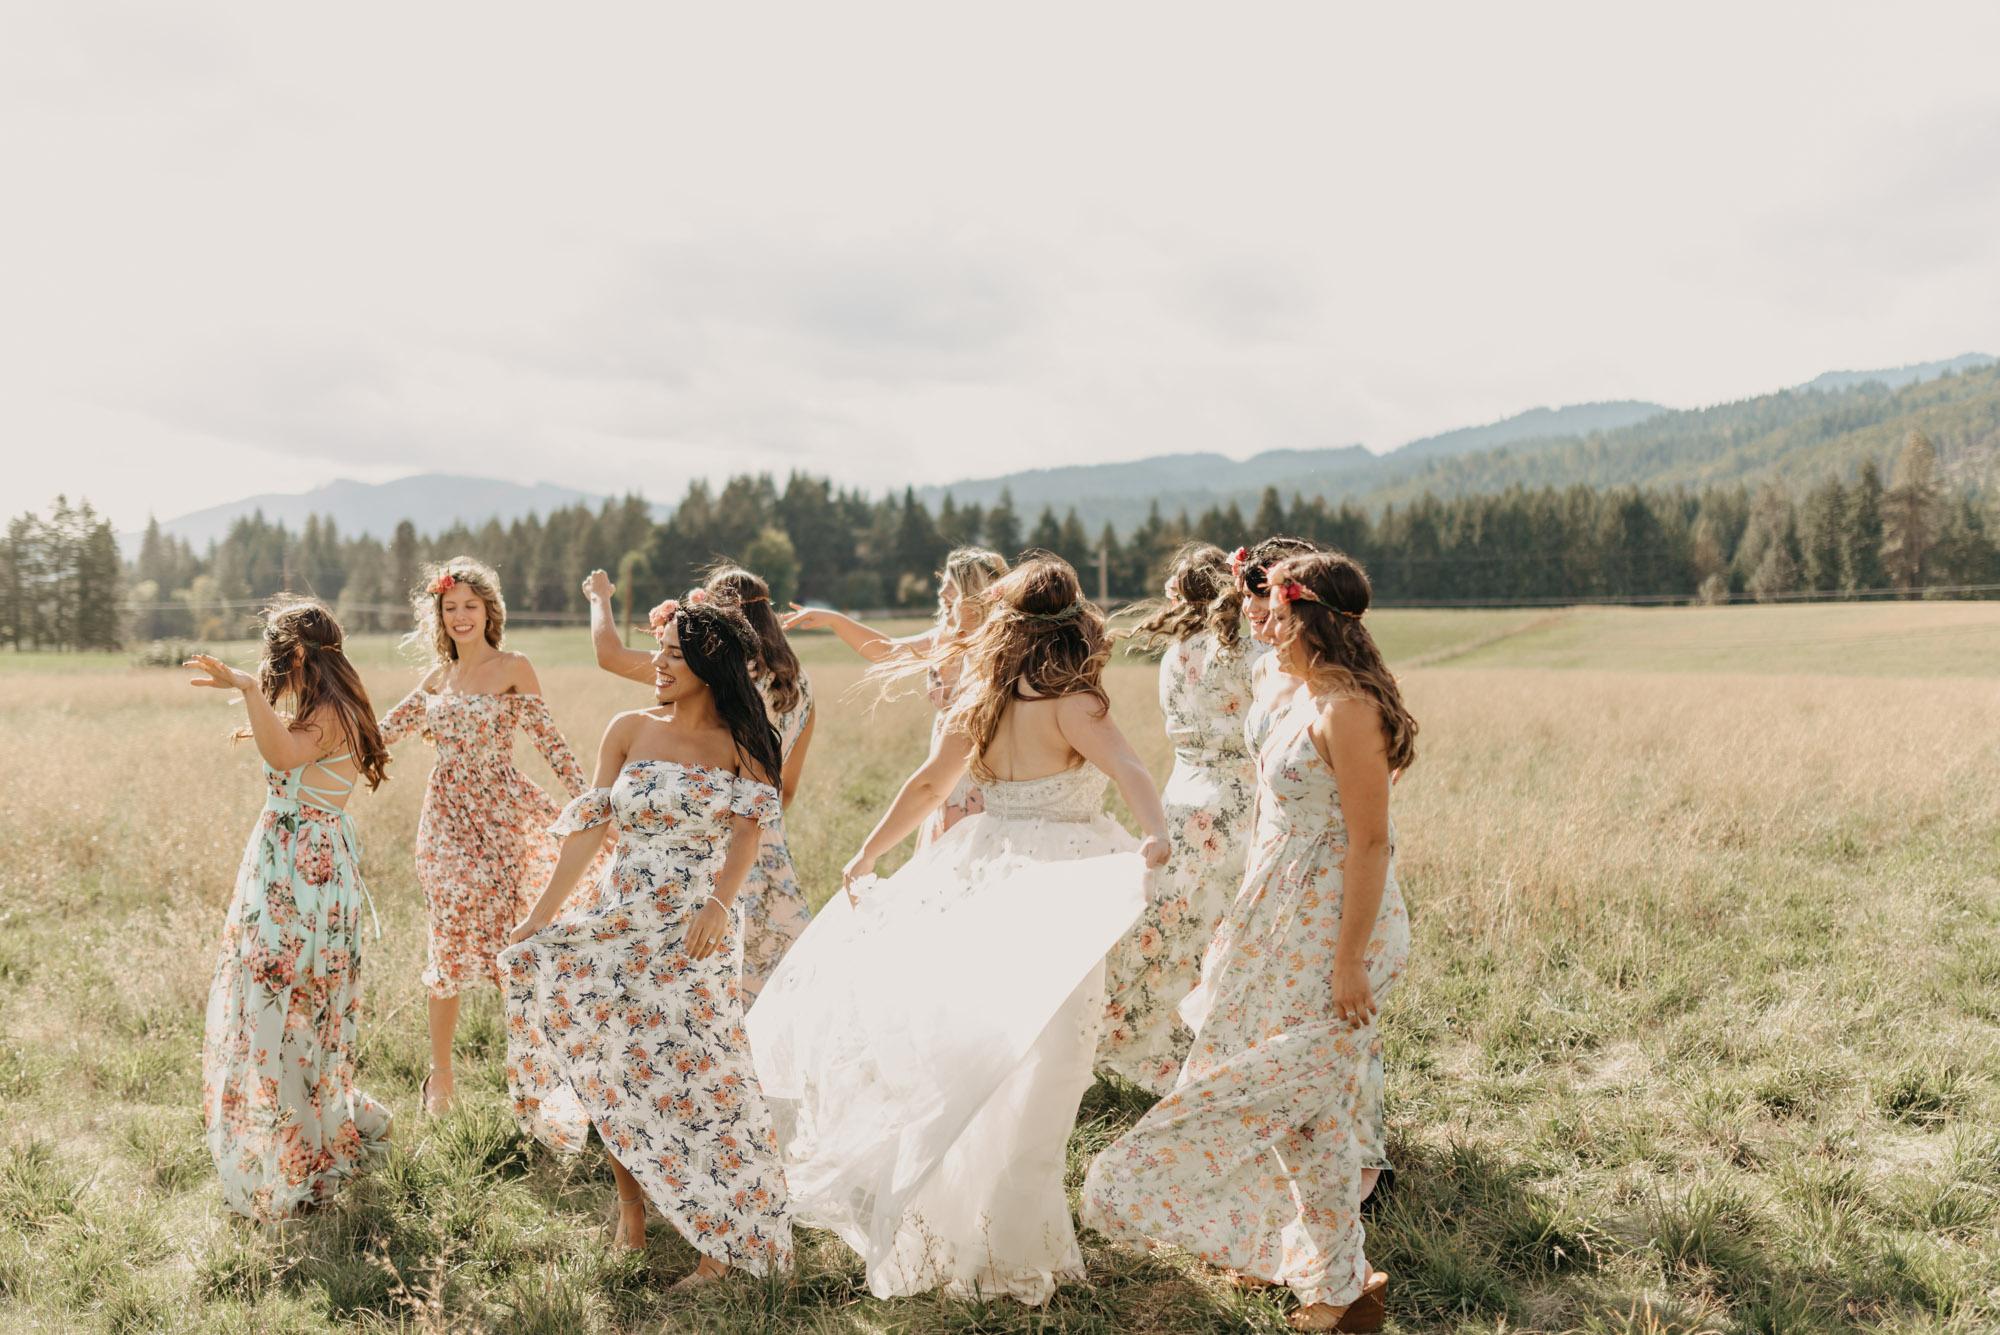 Bridal-Party-Free-People-Flower-Dresses-Washington-Wedding-8559.jpg